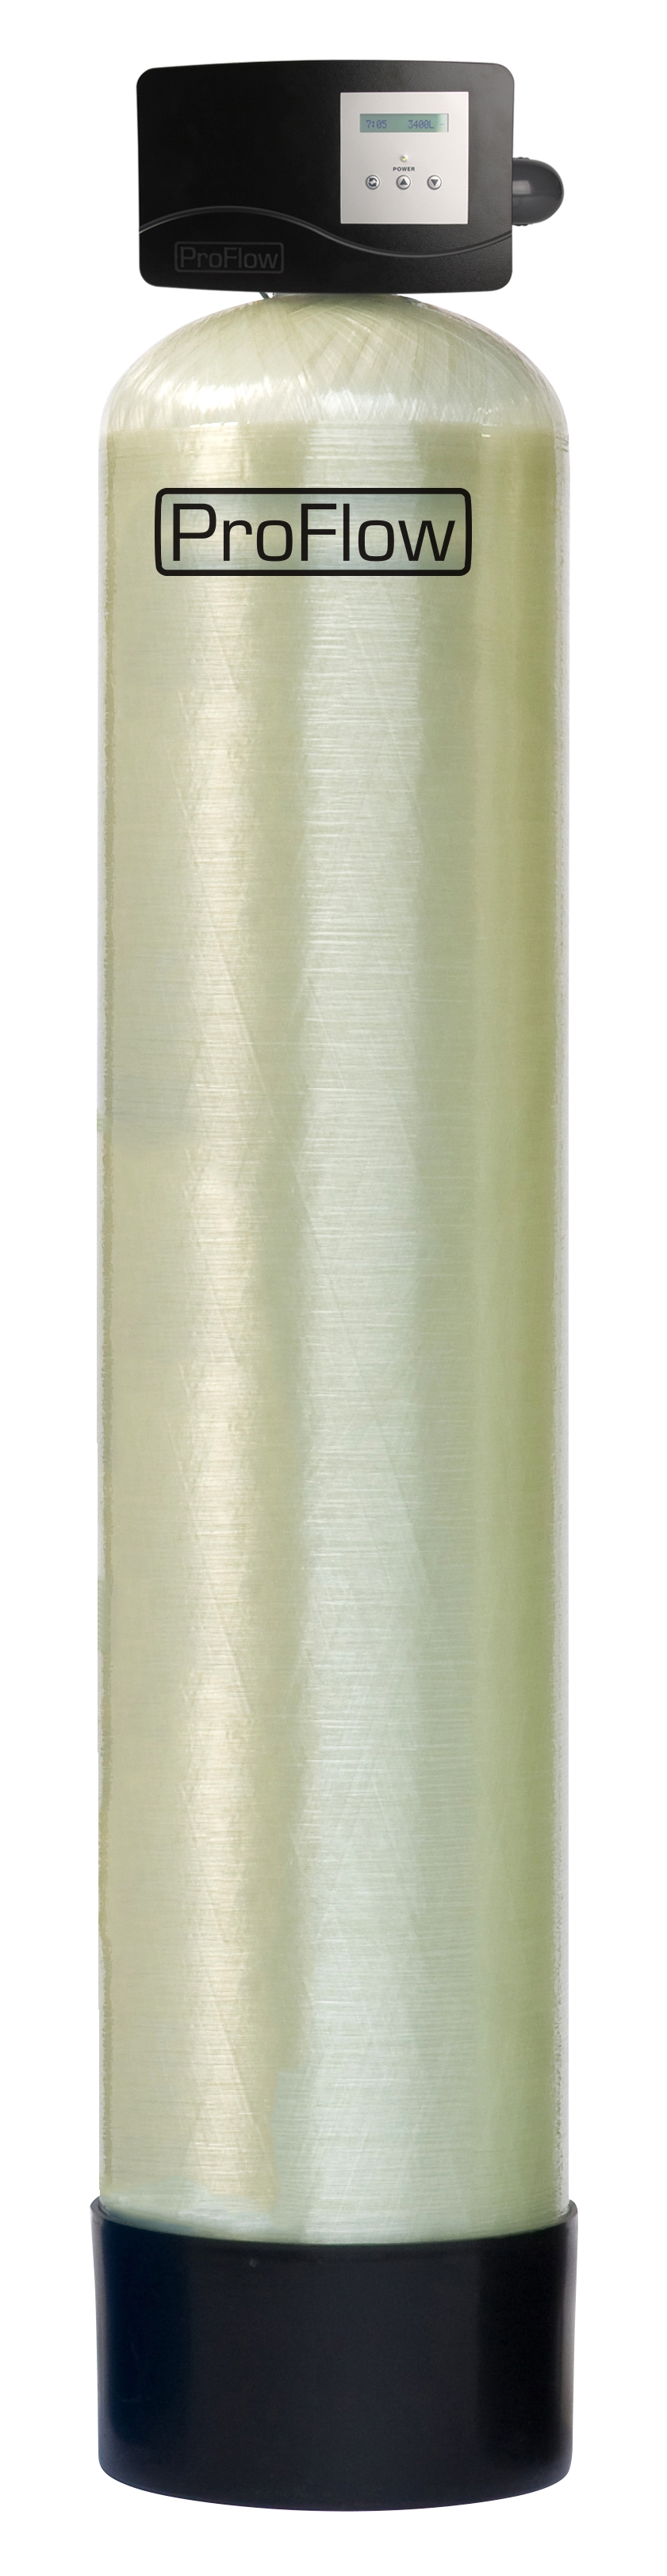 Nugeležinimo filtras PF-OXY1,5 10